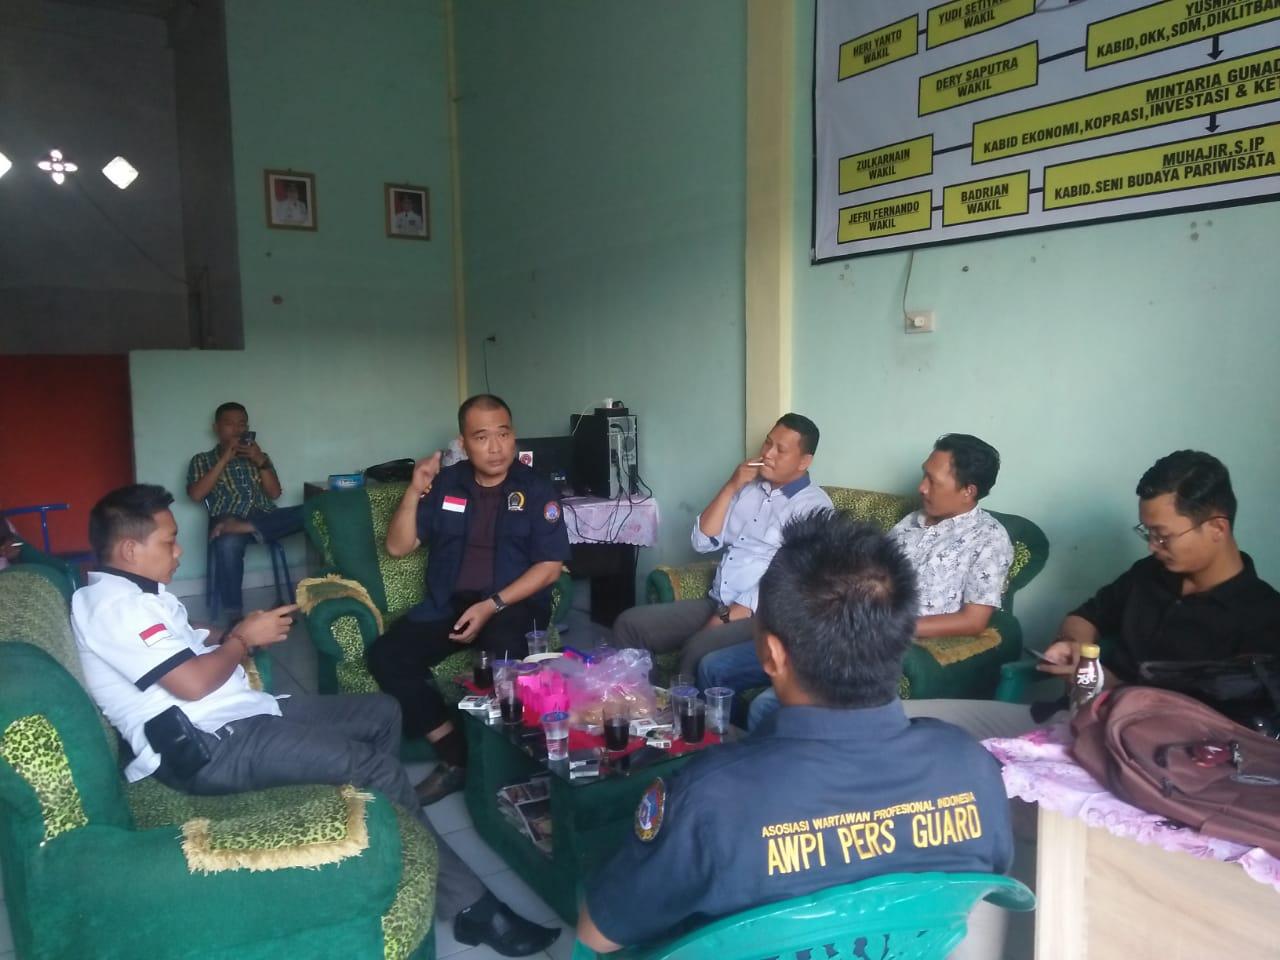 Hengki Ahmad Jazuli Kunjungi Kantor DPC AWPI Lampung Utara